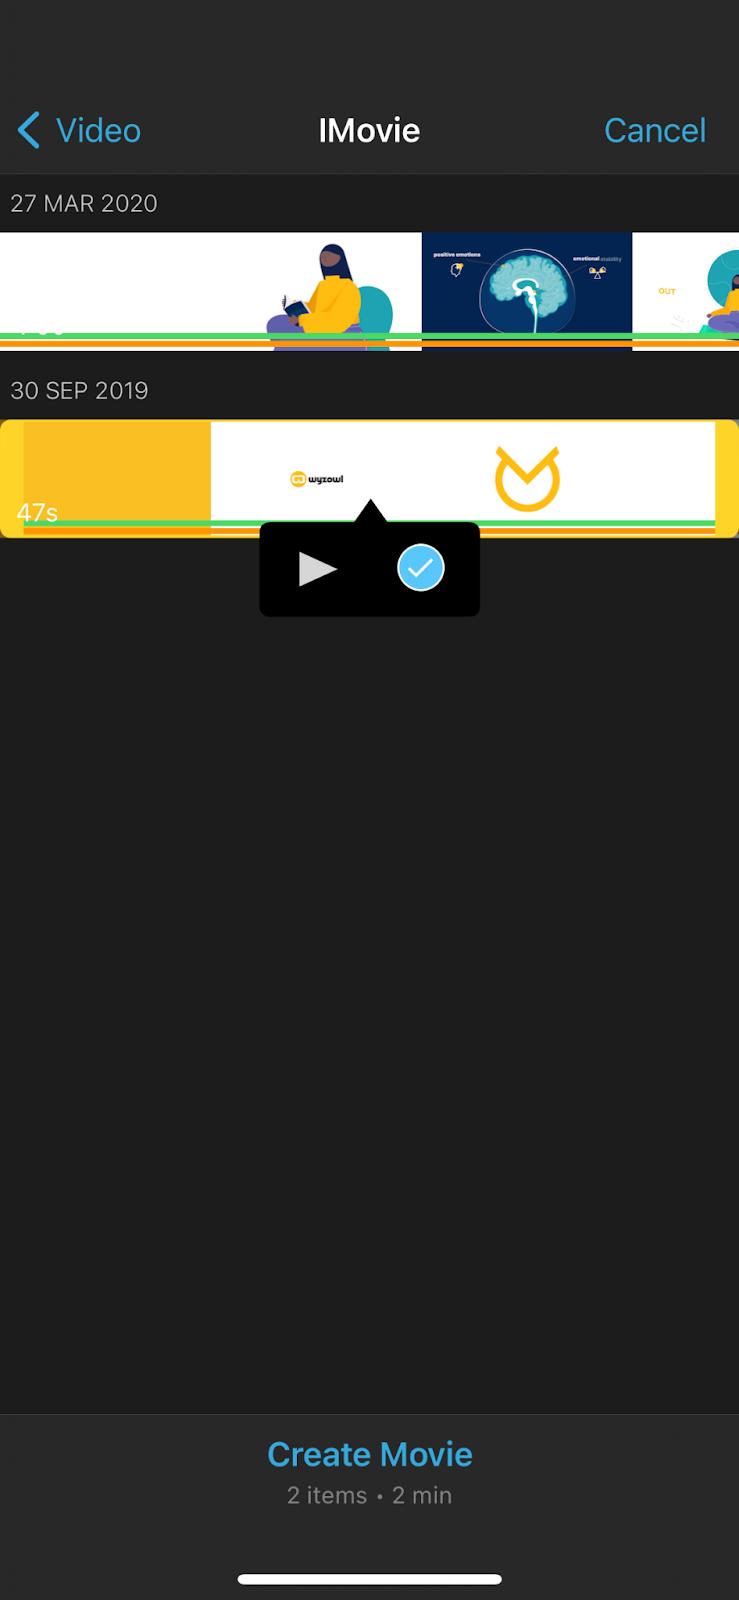 iMovie on iPhone